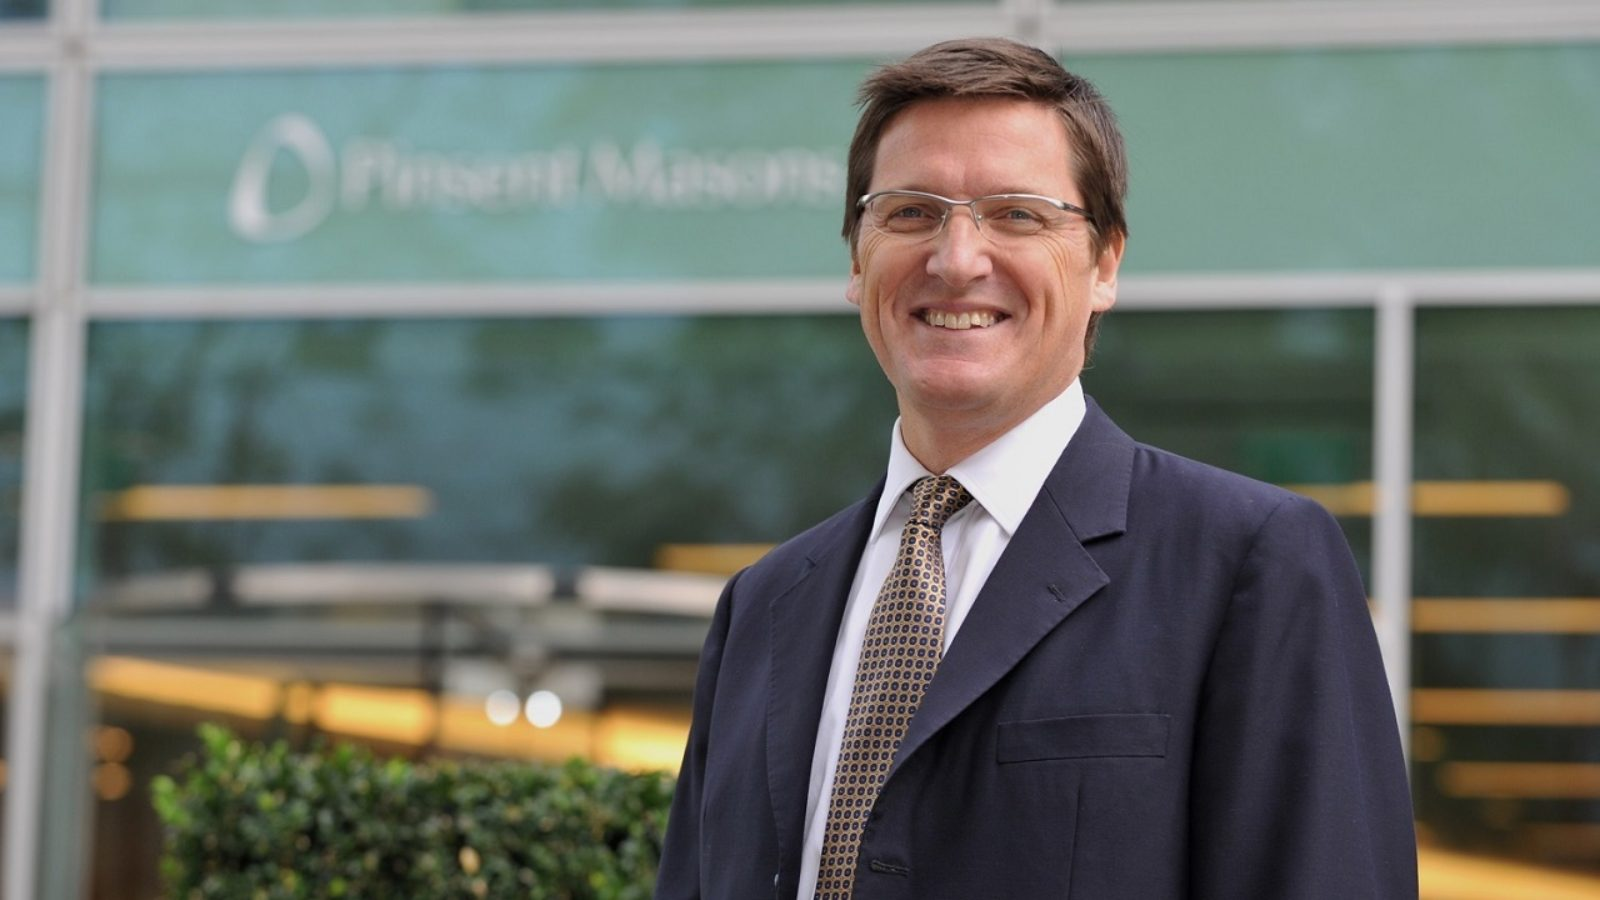 Richard Foley Senior Partner Pinsent Masons LLP